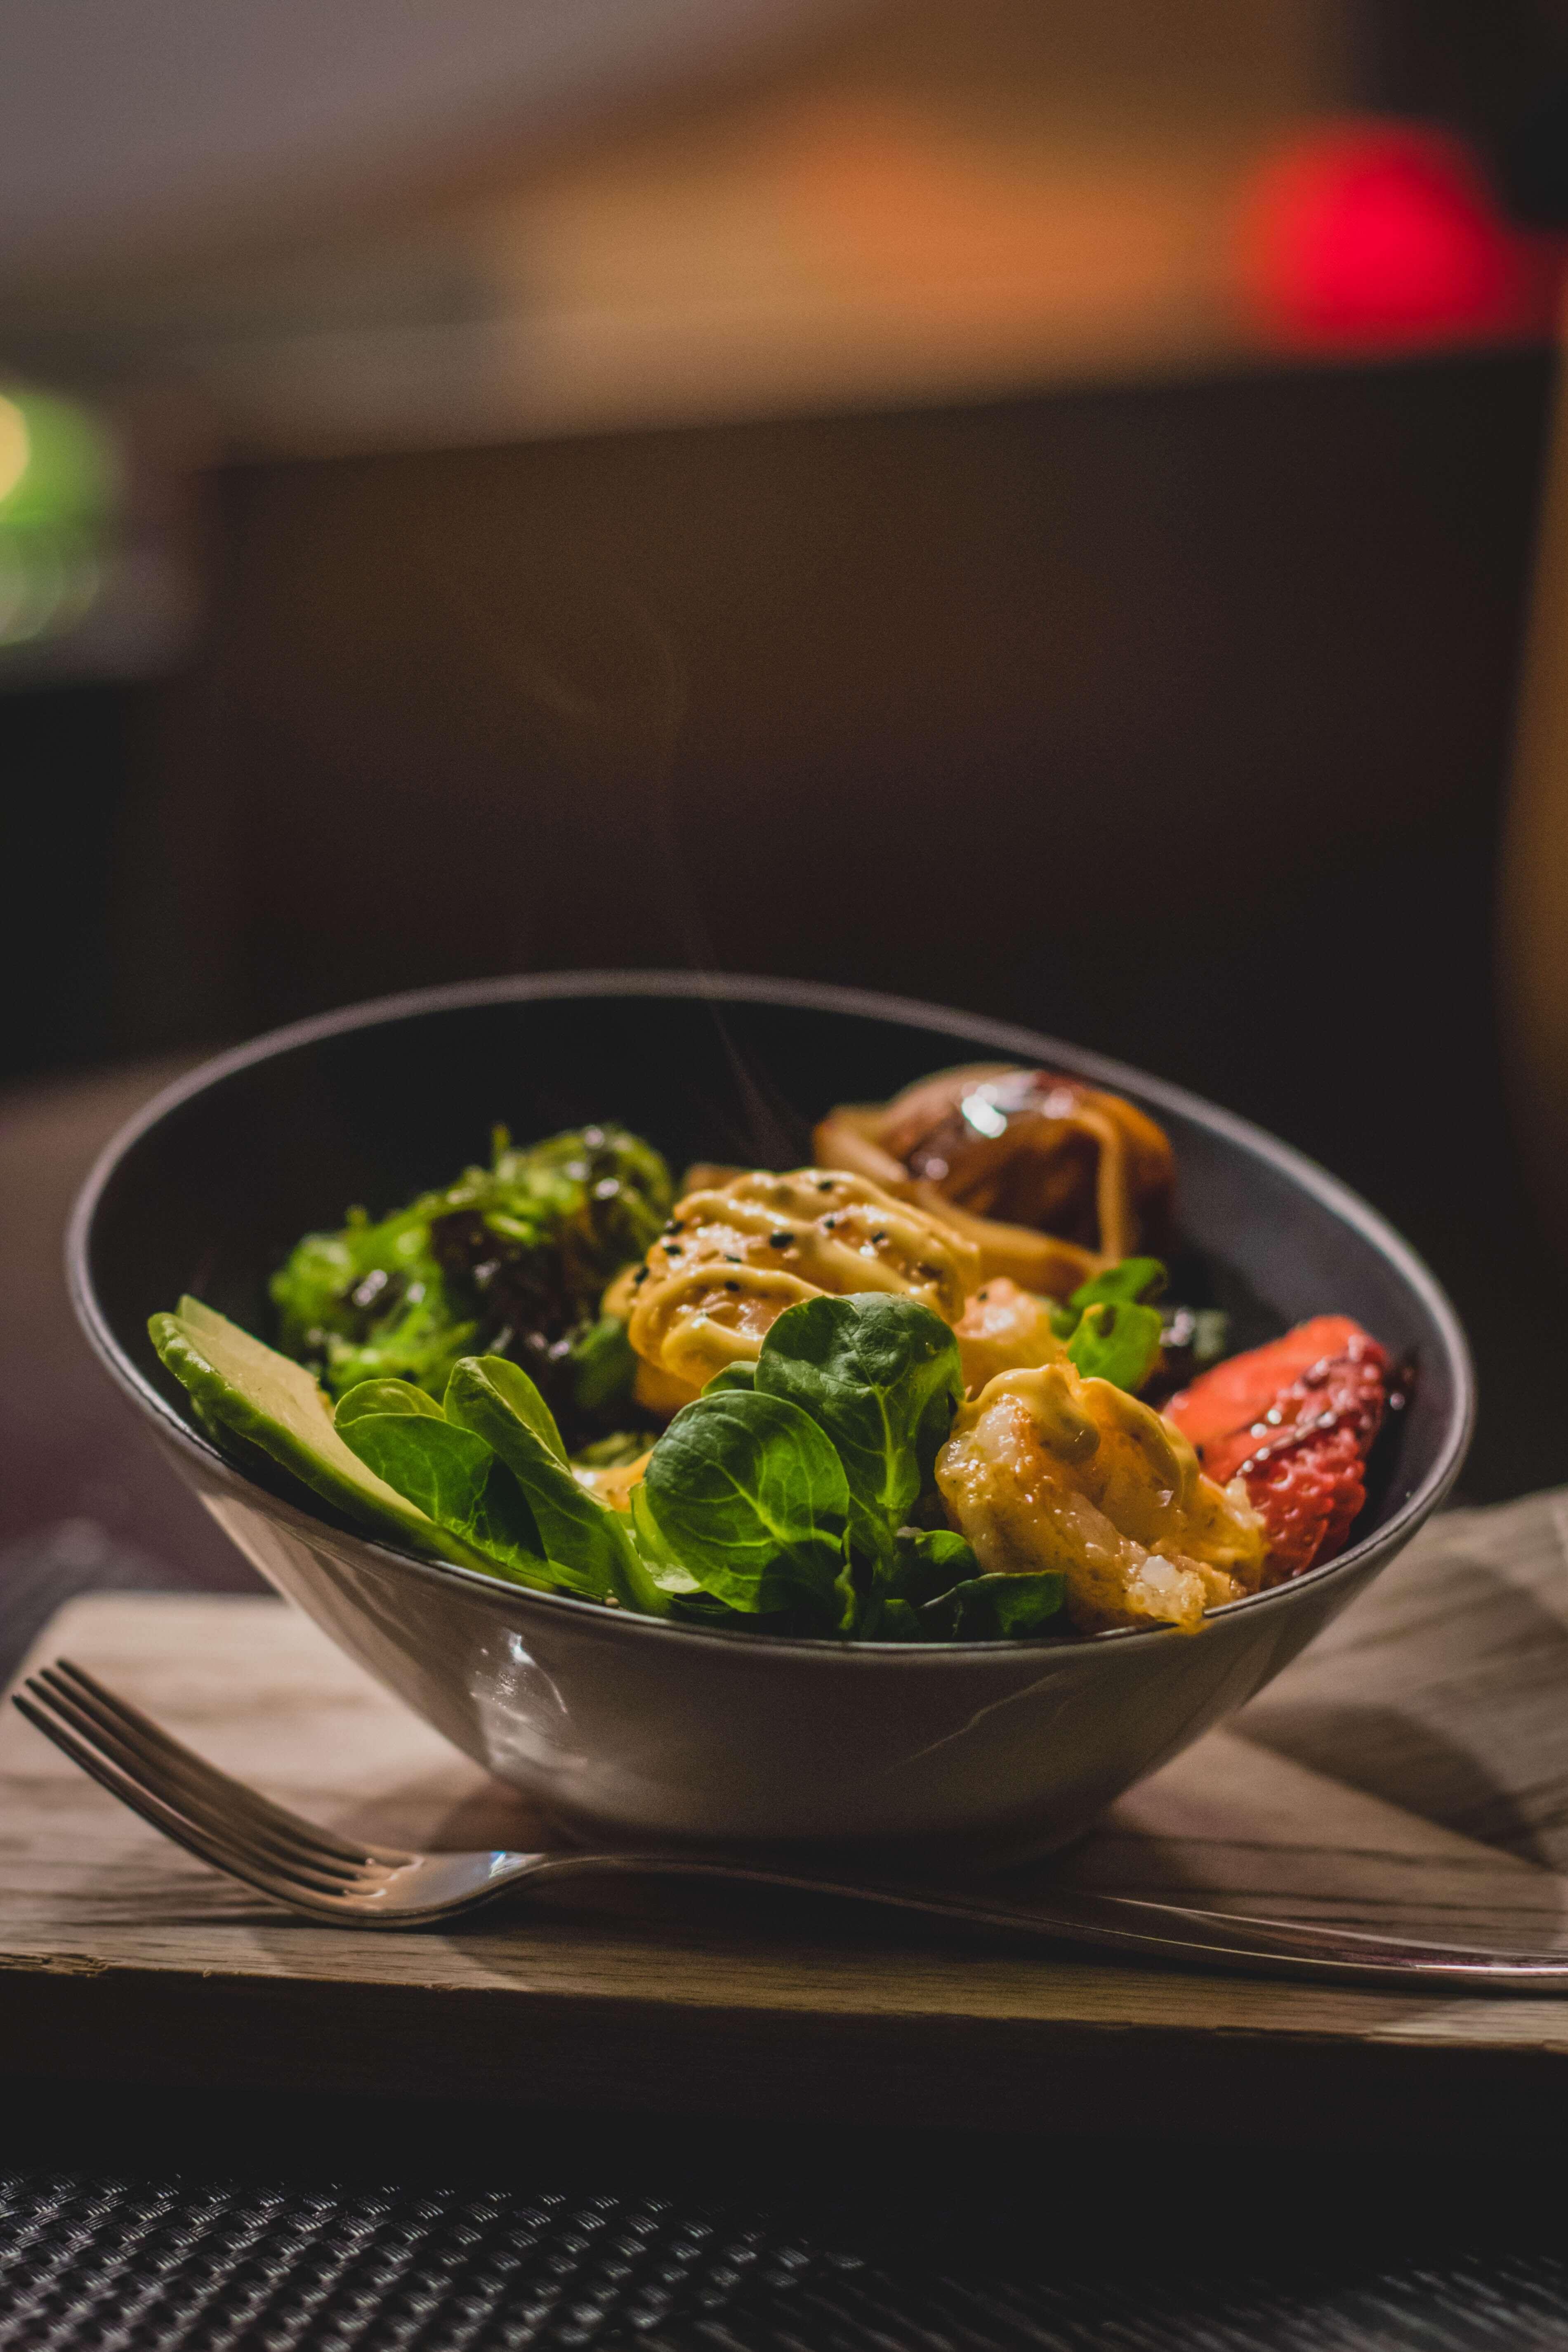 Seafood served in grey slanted bowl